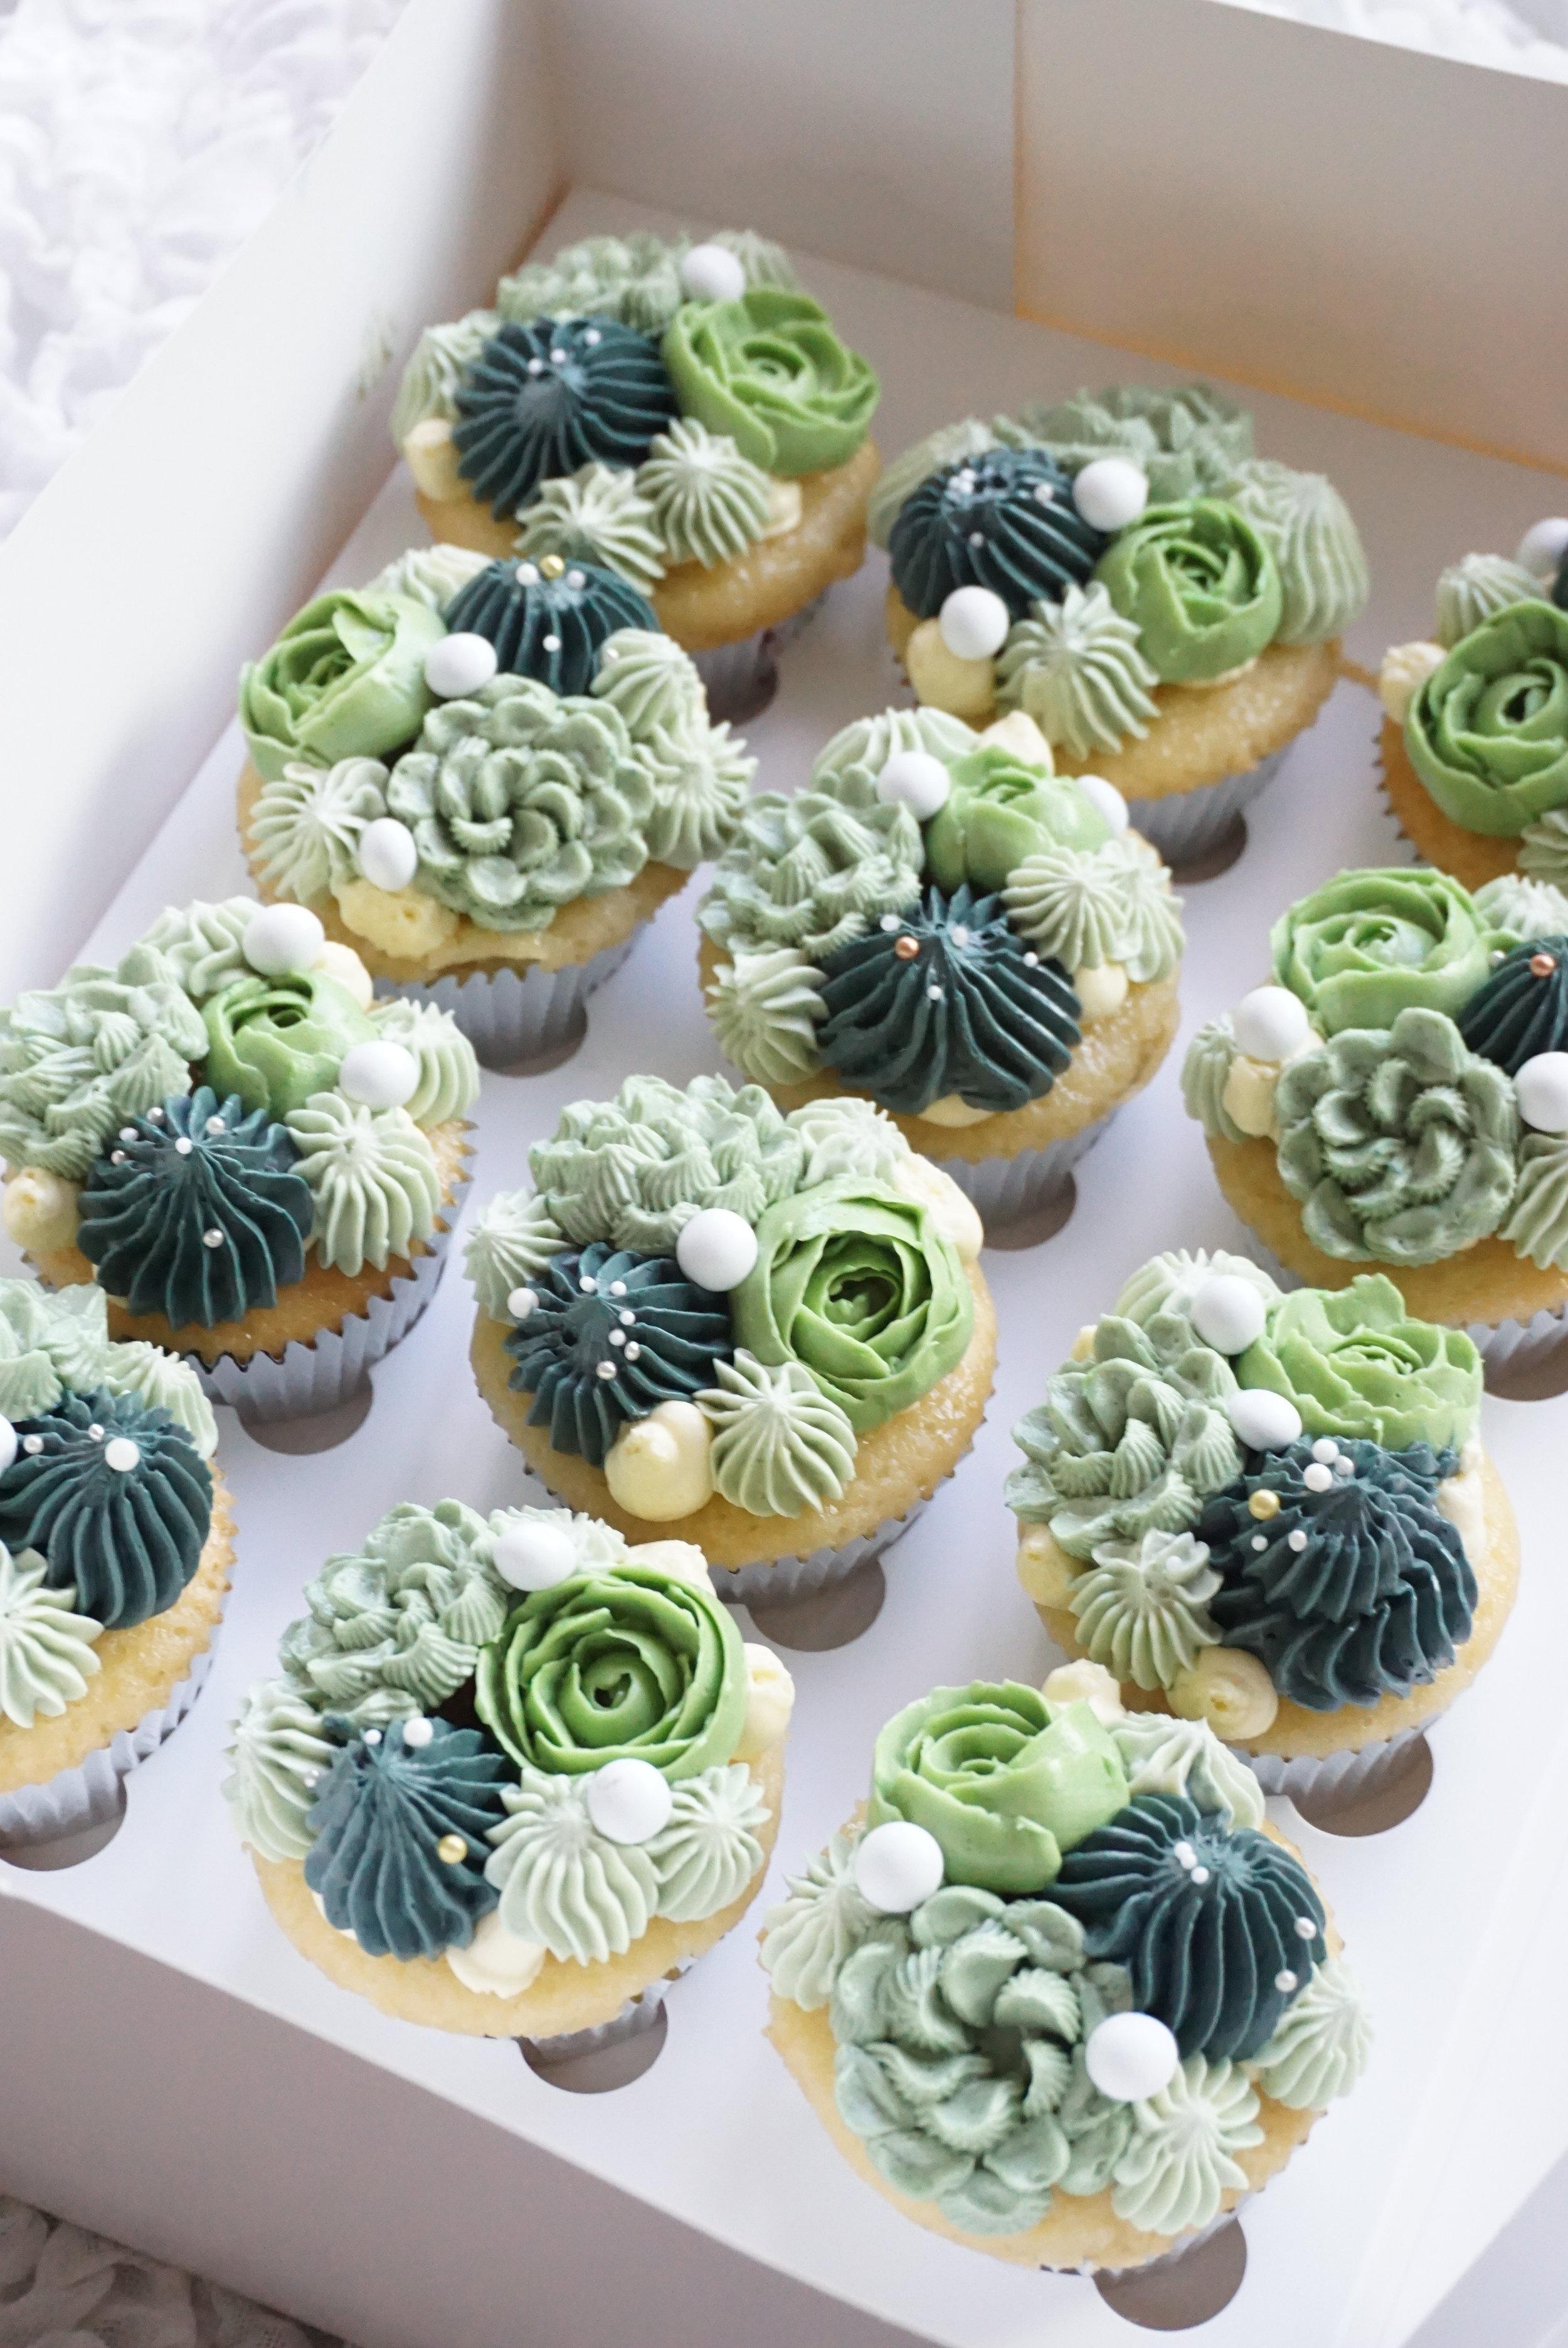 Cakes_By_Aranee_Perth_Drip_Cakes_Custom_Cakes_Wedding_Cakes_Macarons_Cupcakes_Personalised_Cookies_OTHER_DESSERTS_Gallery7.jpg